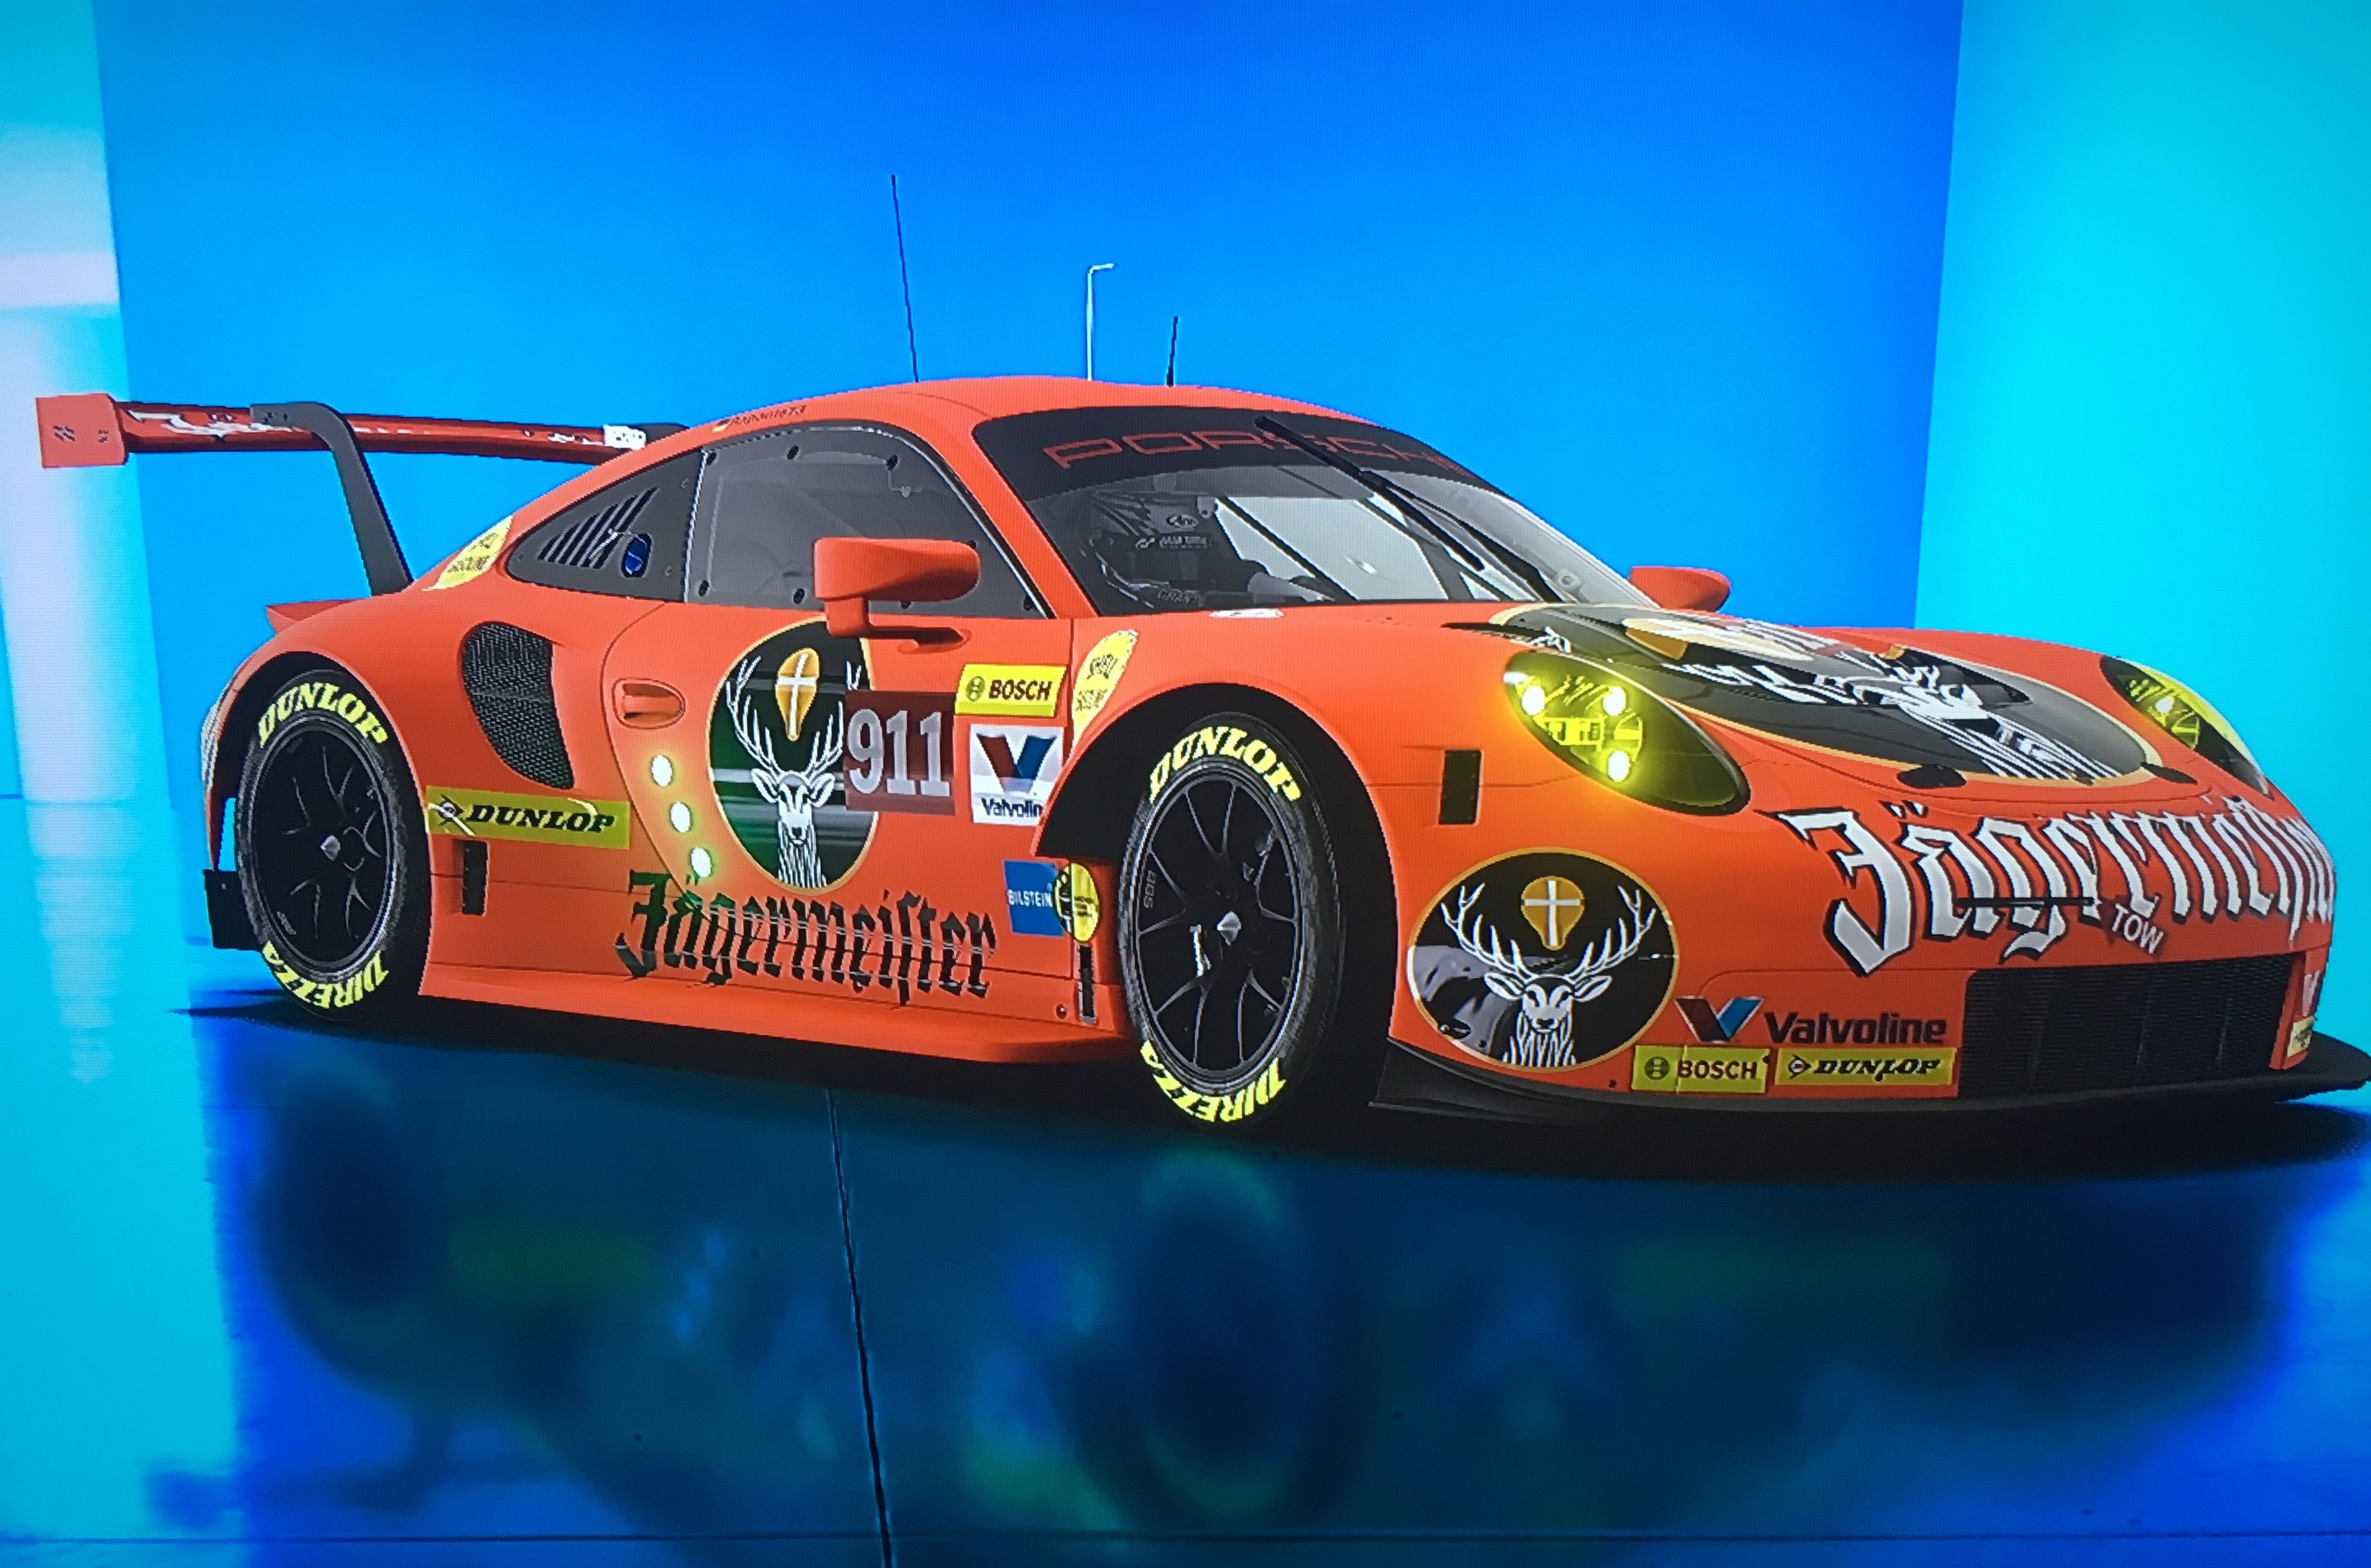 Pin By David Vickers On Jagermeister Porsche 911 Gt3 Car Model Porsche